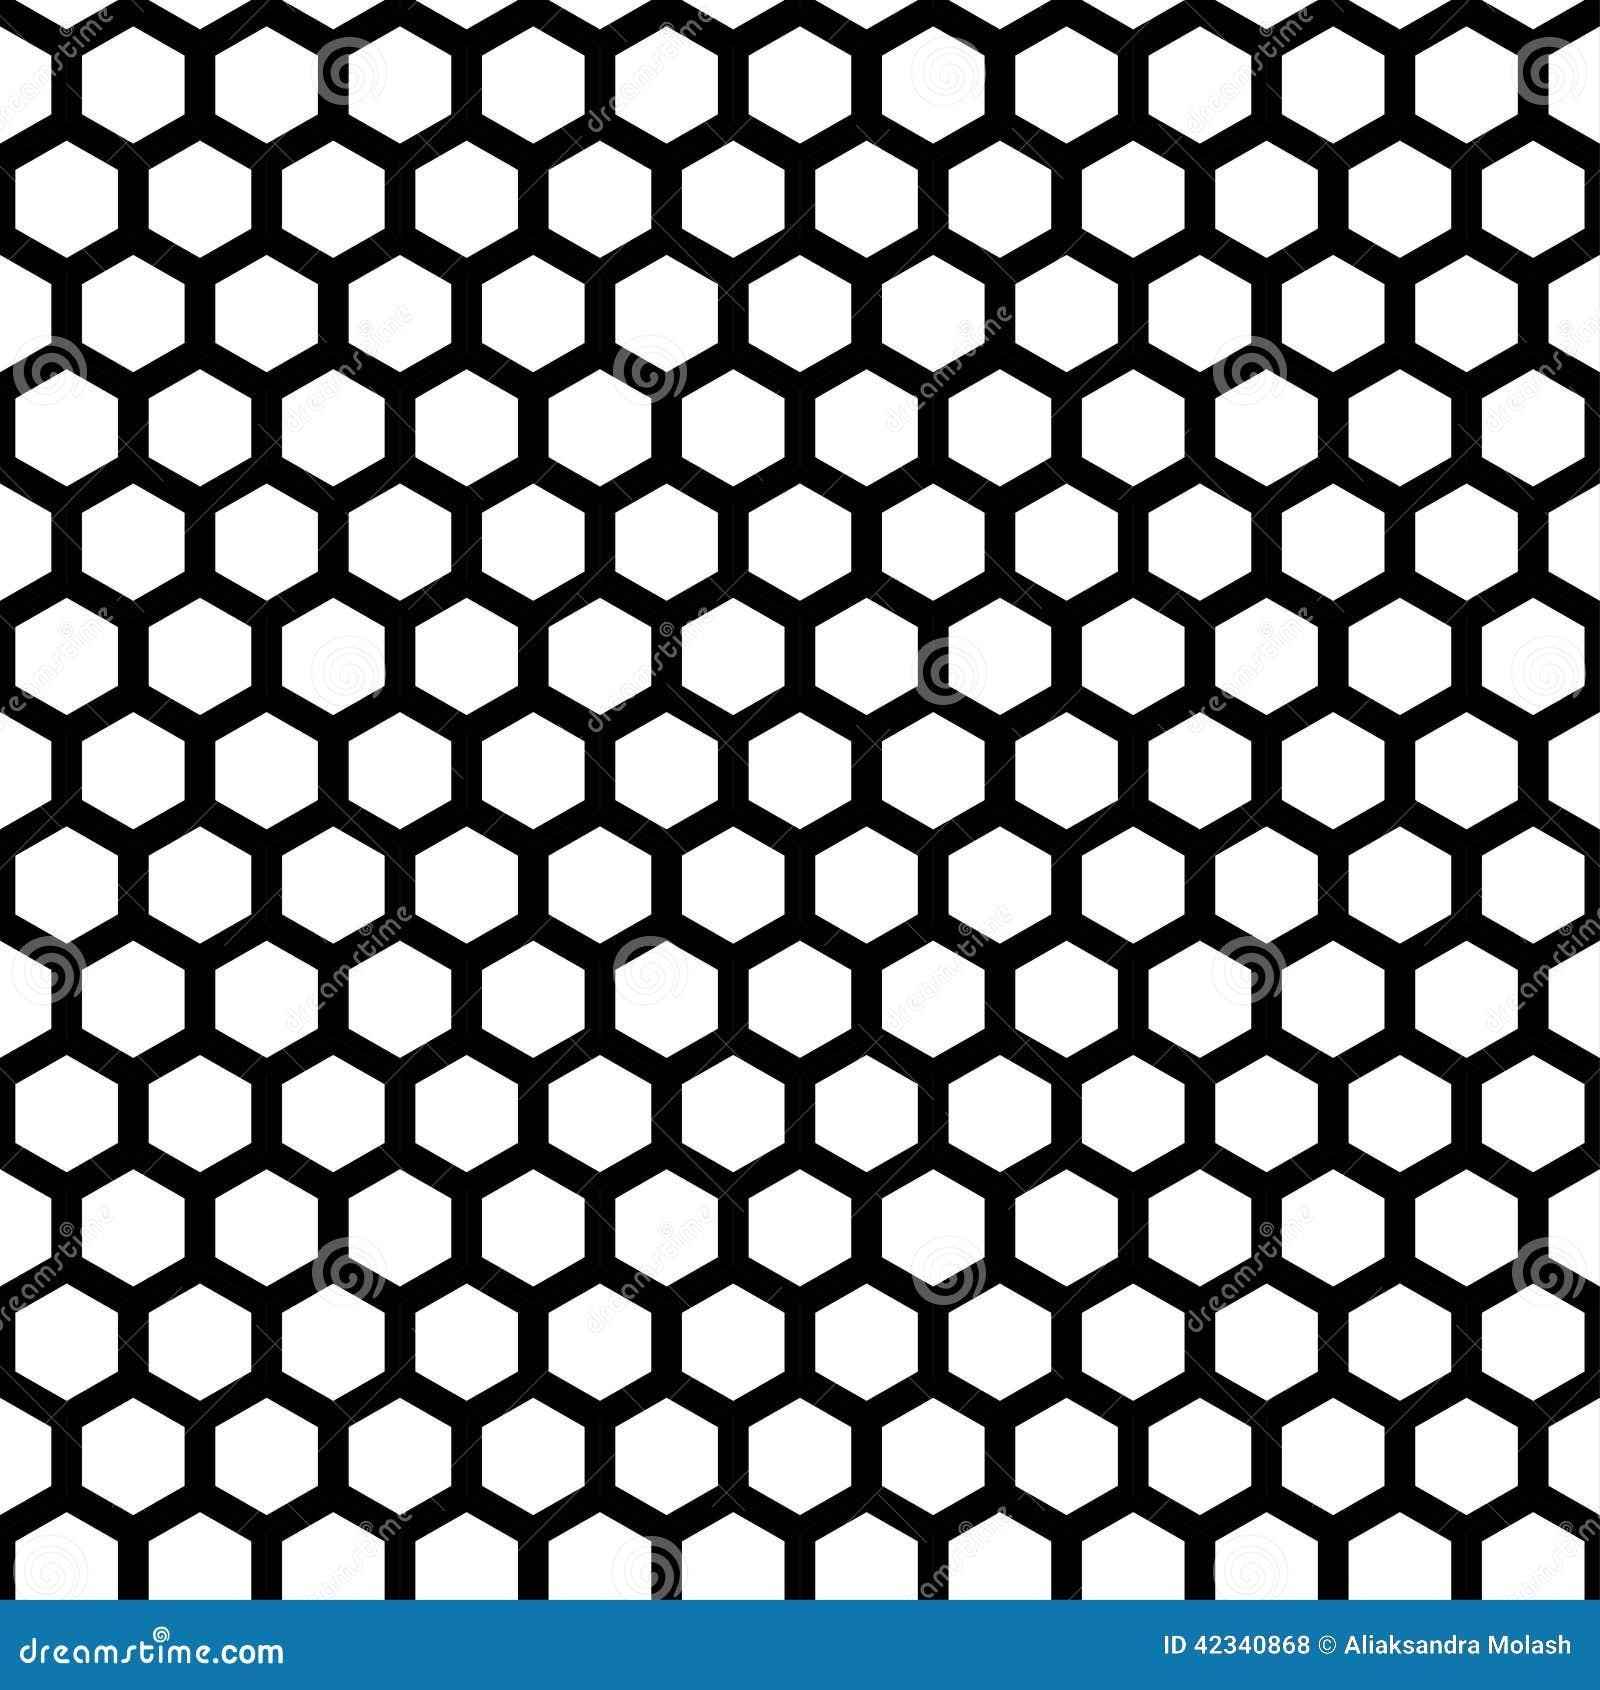 Honeycomb Seamless Pattern Stock Vector - Image: 42340868